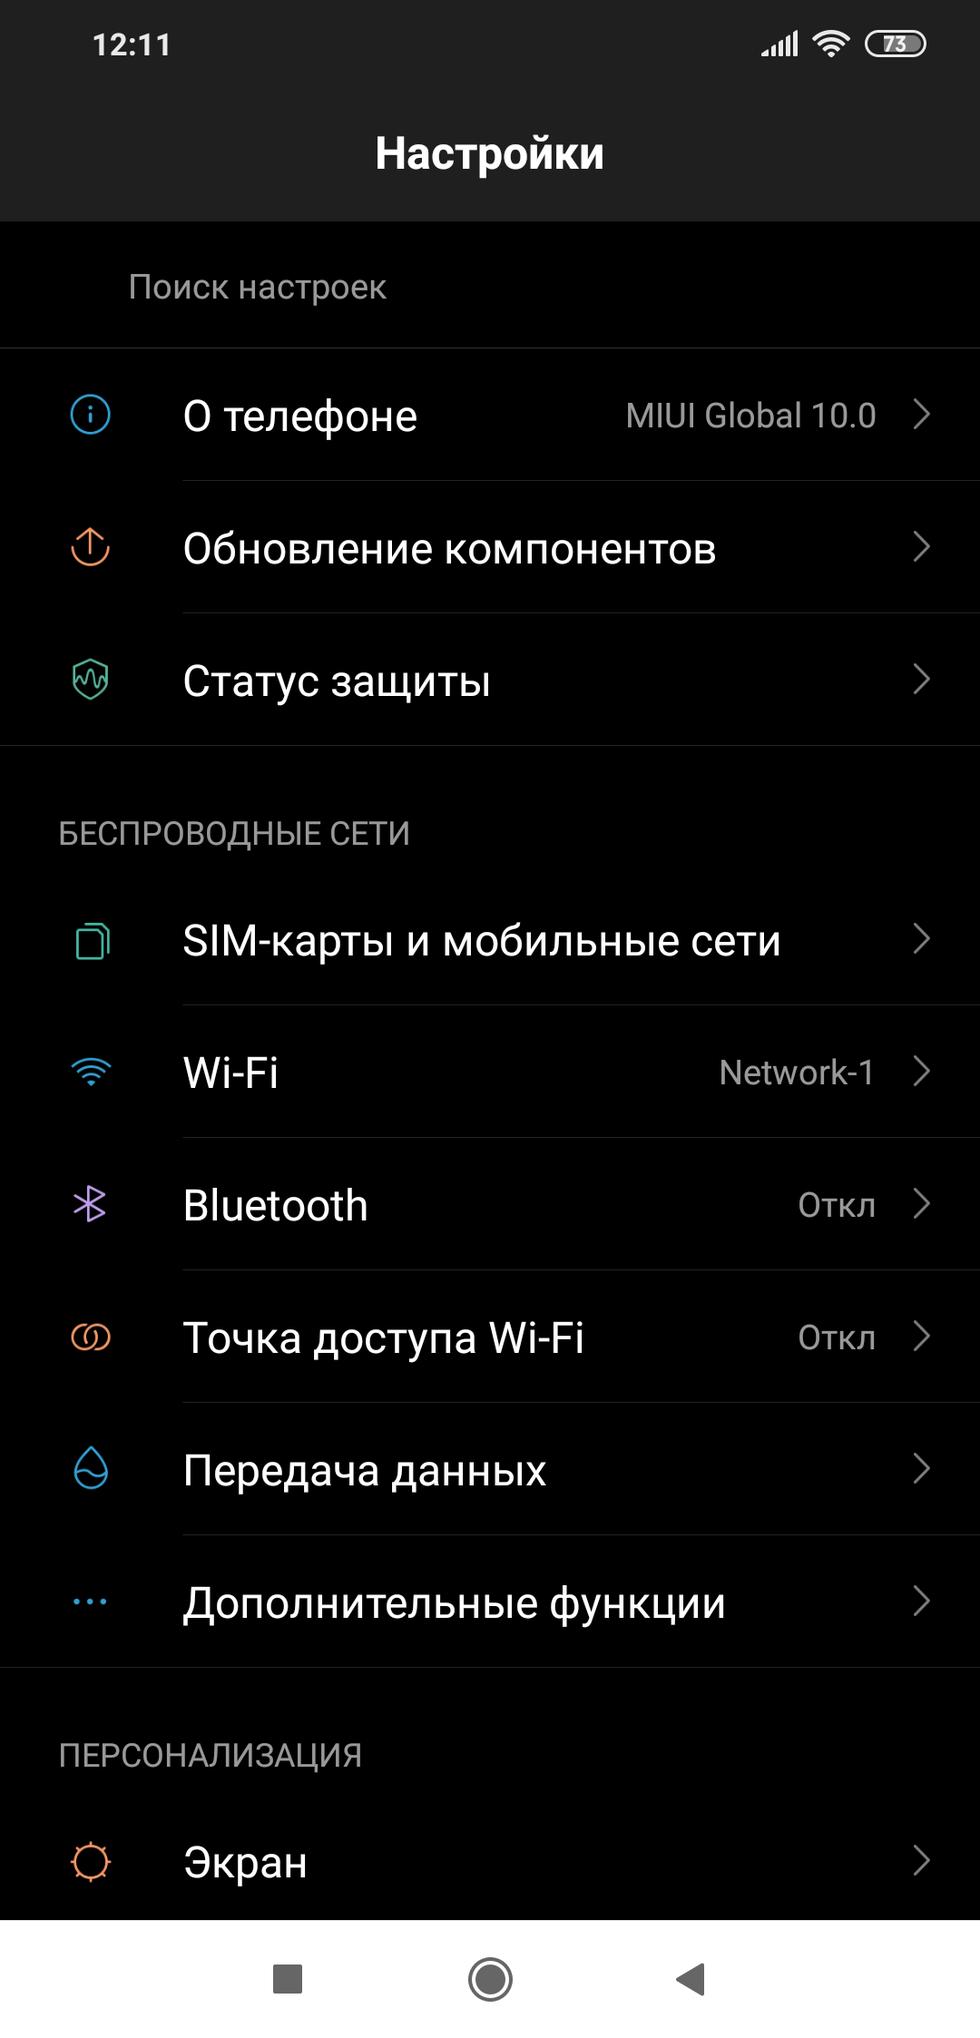 Screenshot_2019-01-12-12-11-22-113_com.android.settings.png